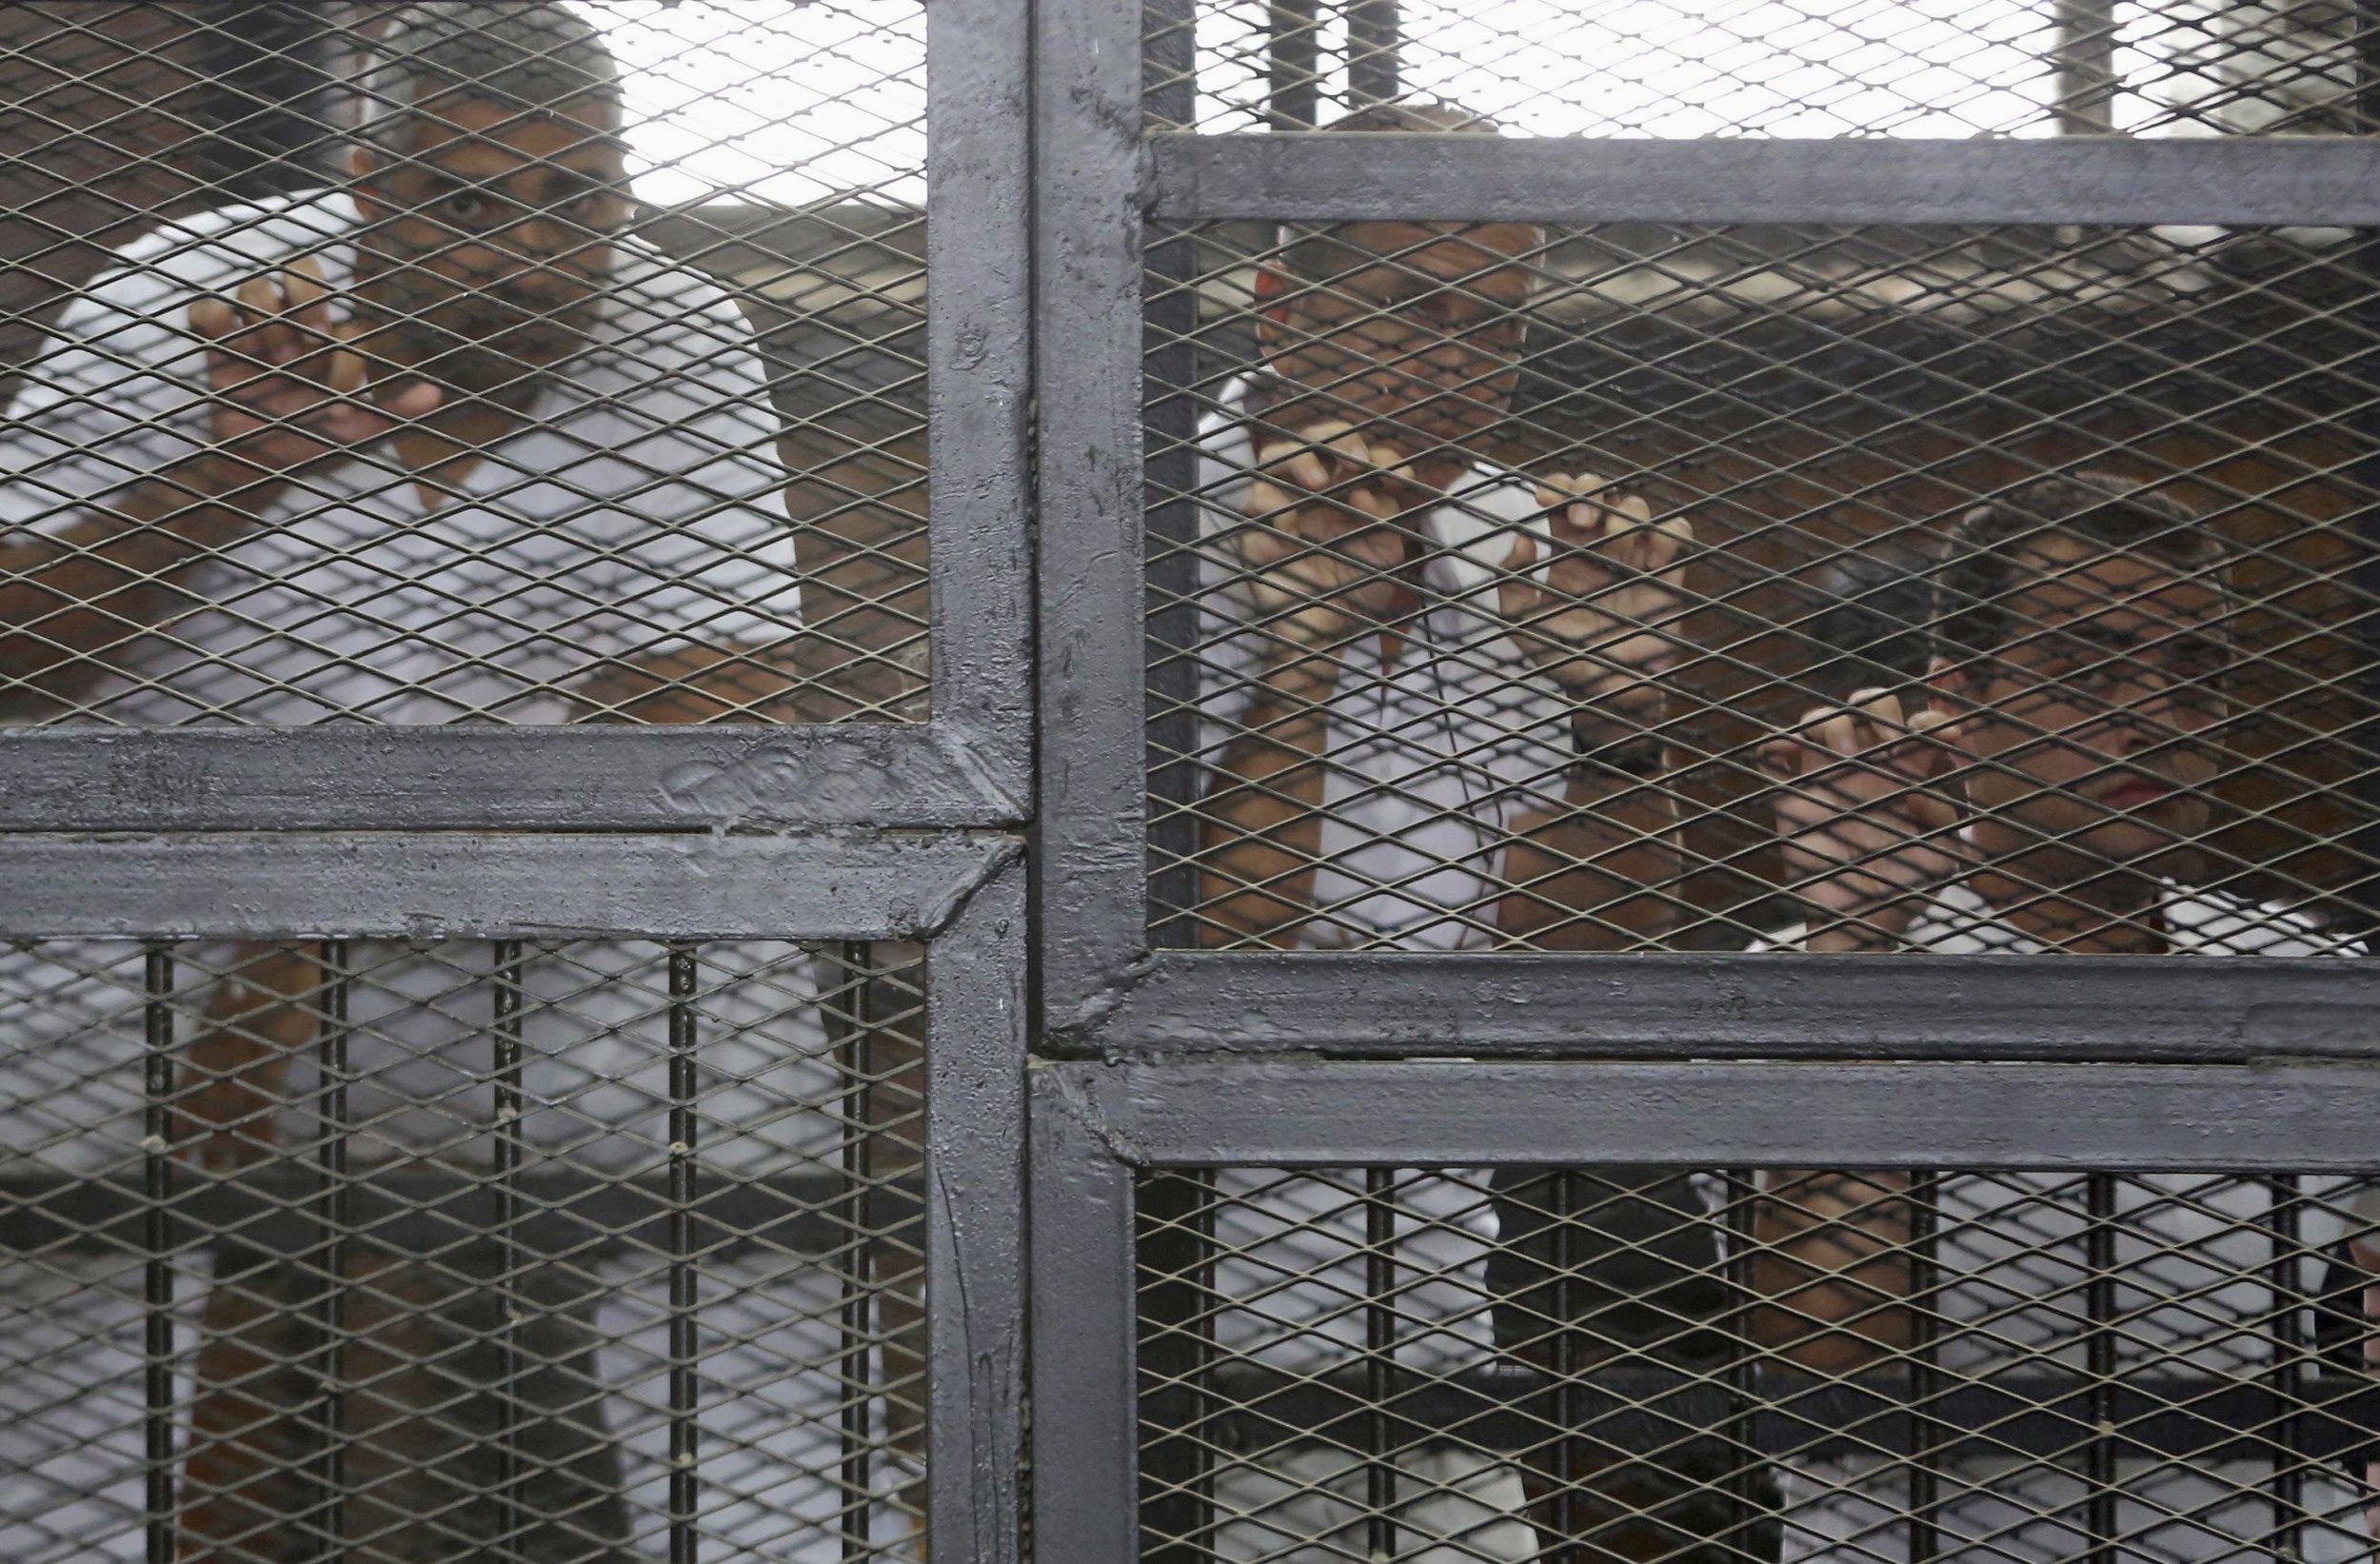 0923_Al-Jazeera-Journalists_01